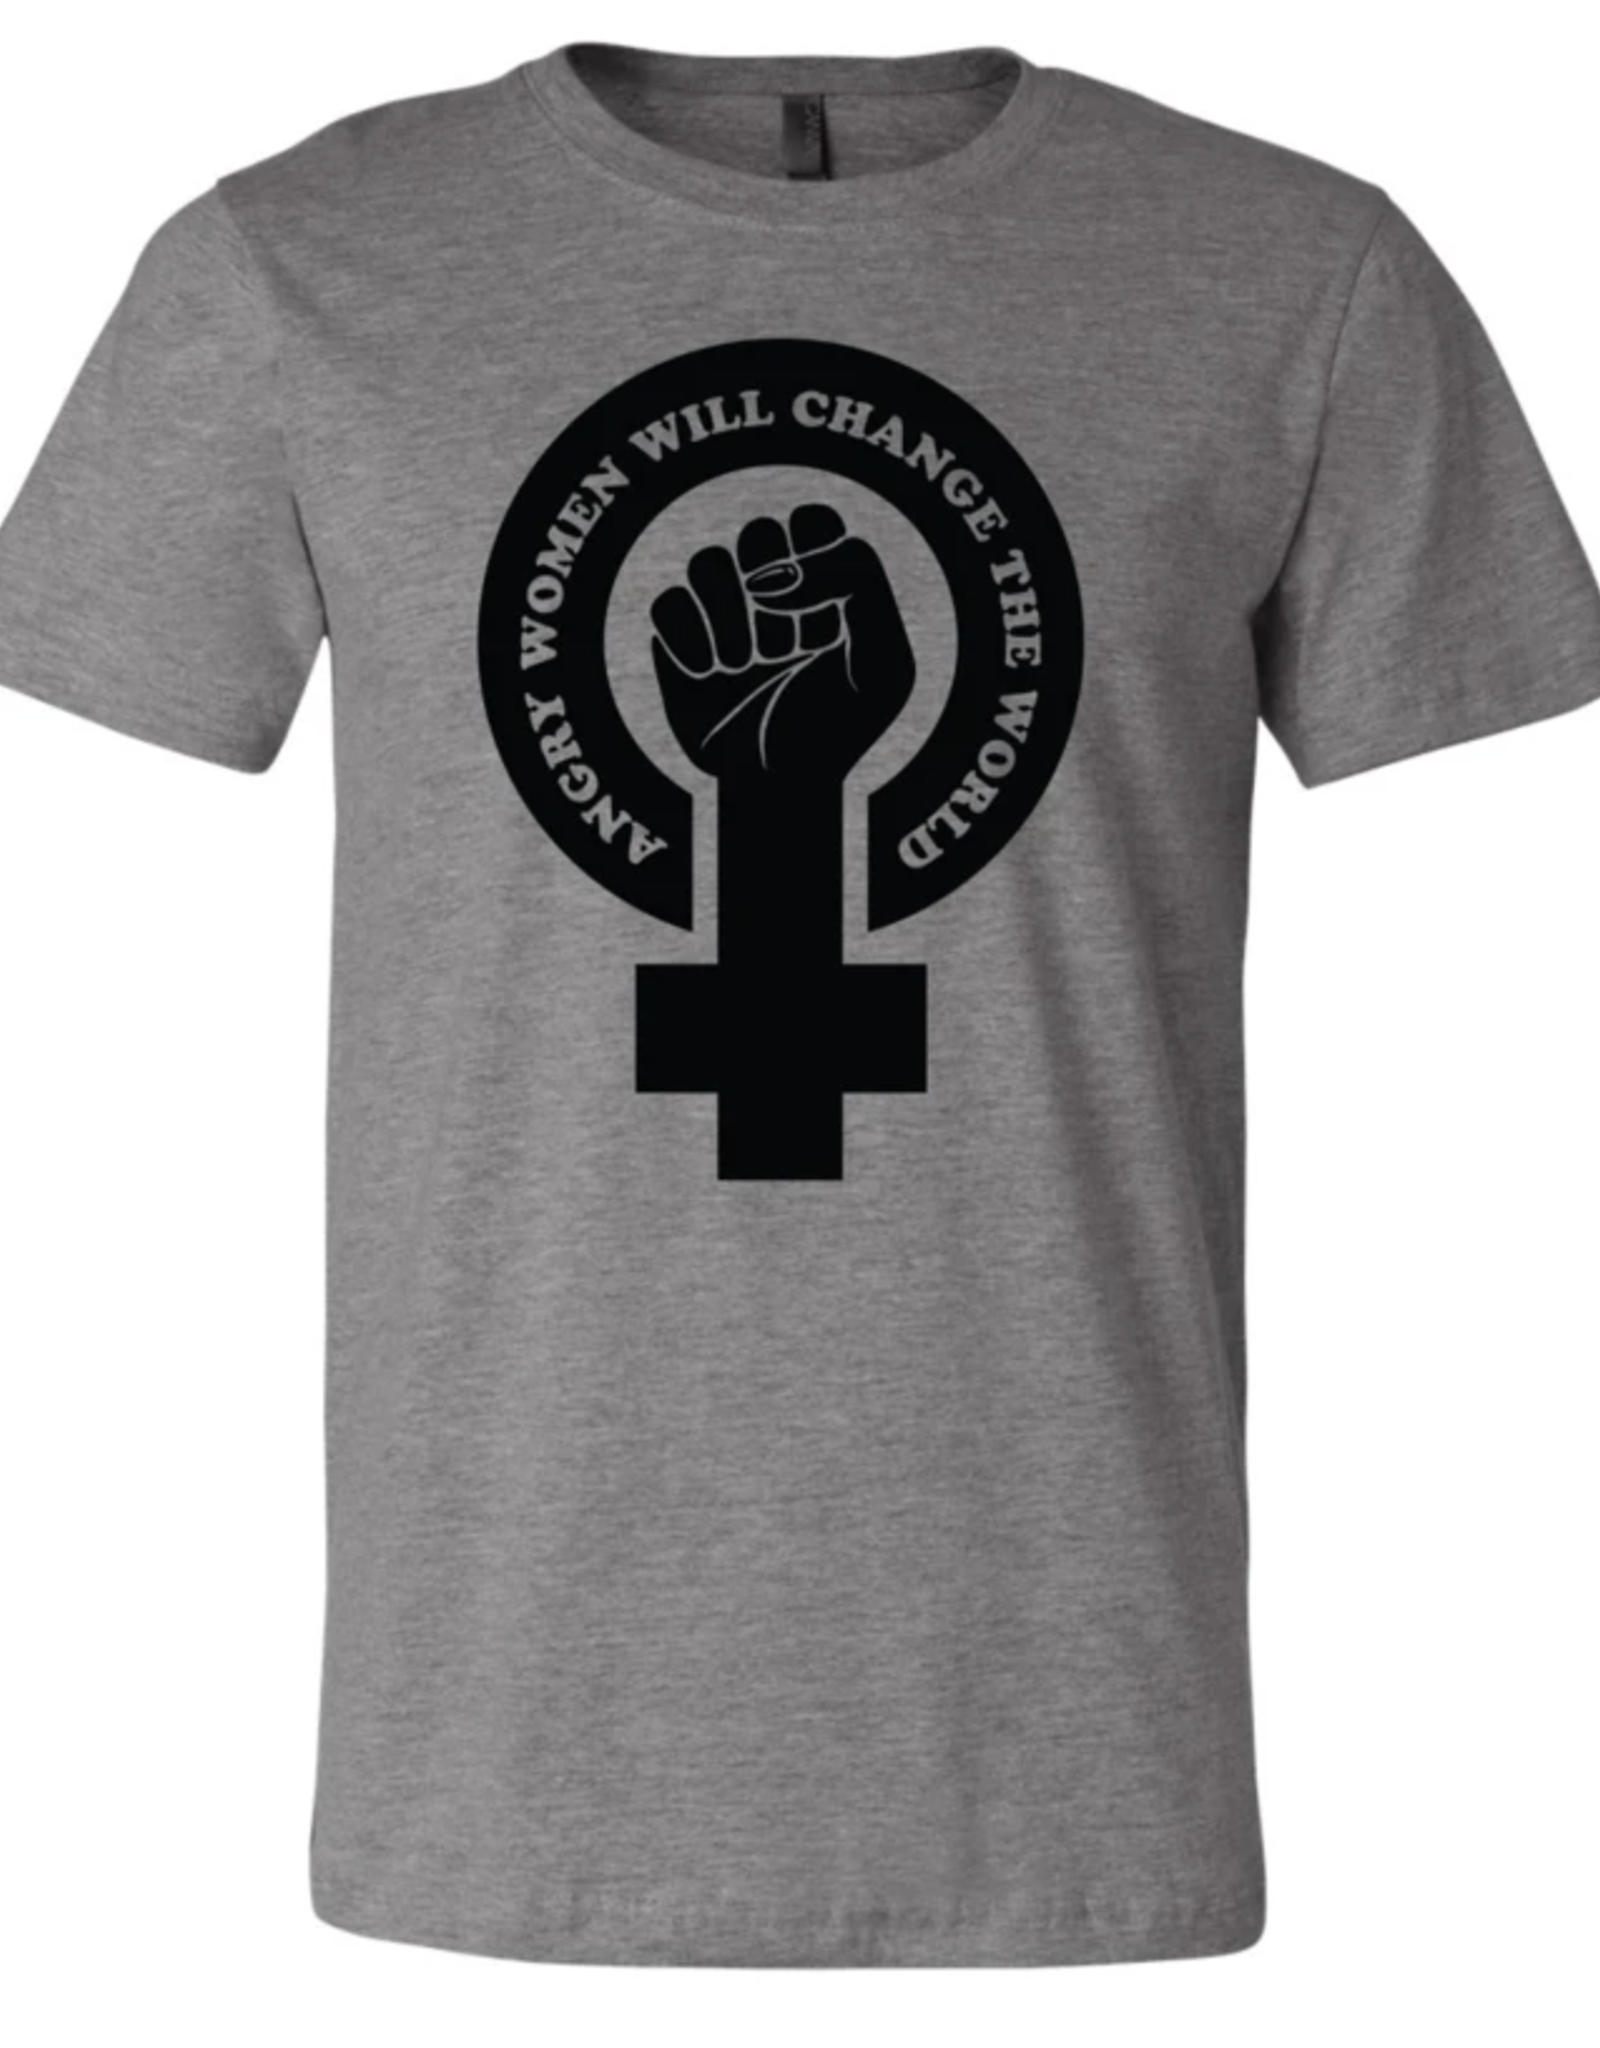 Mik Mocha Angry Women Will Change The World Unisex Tee